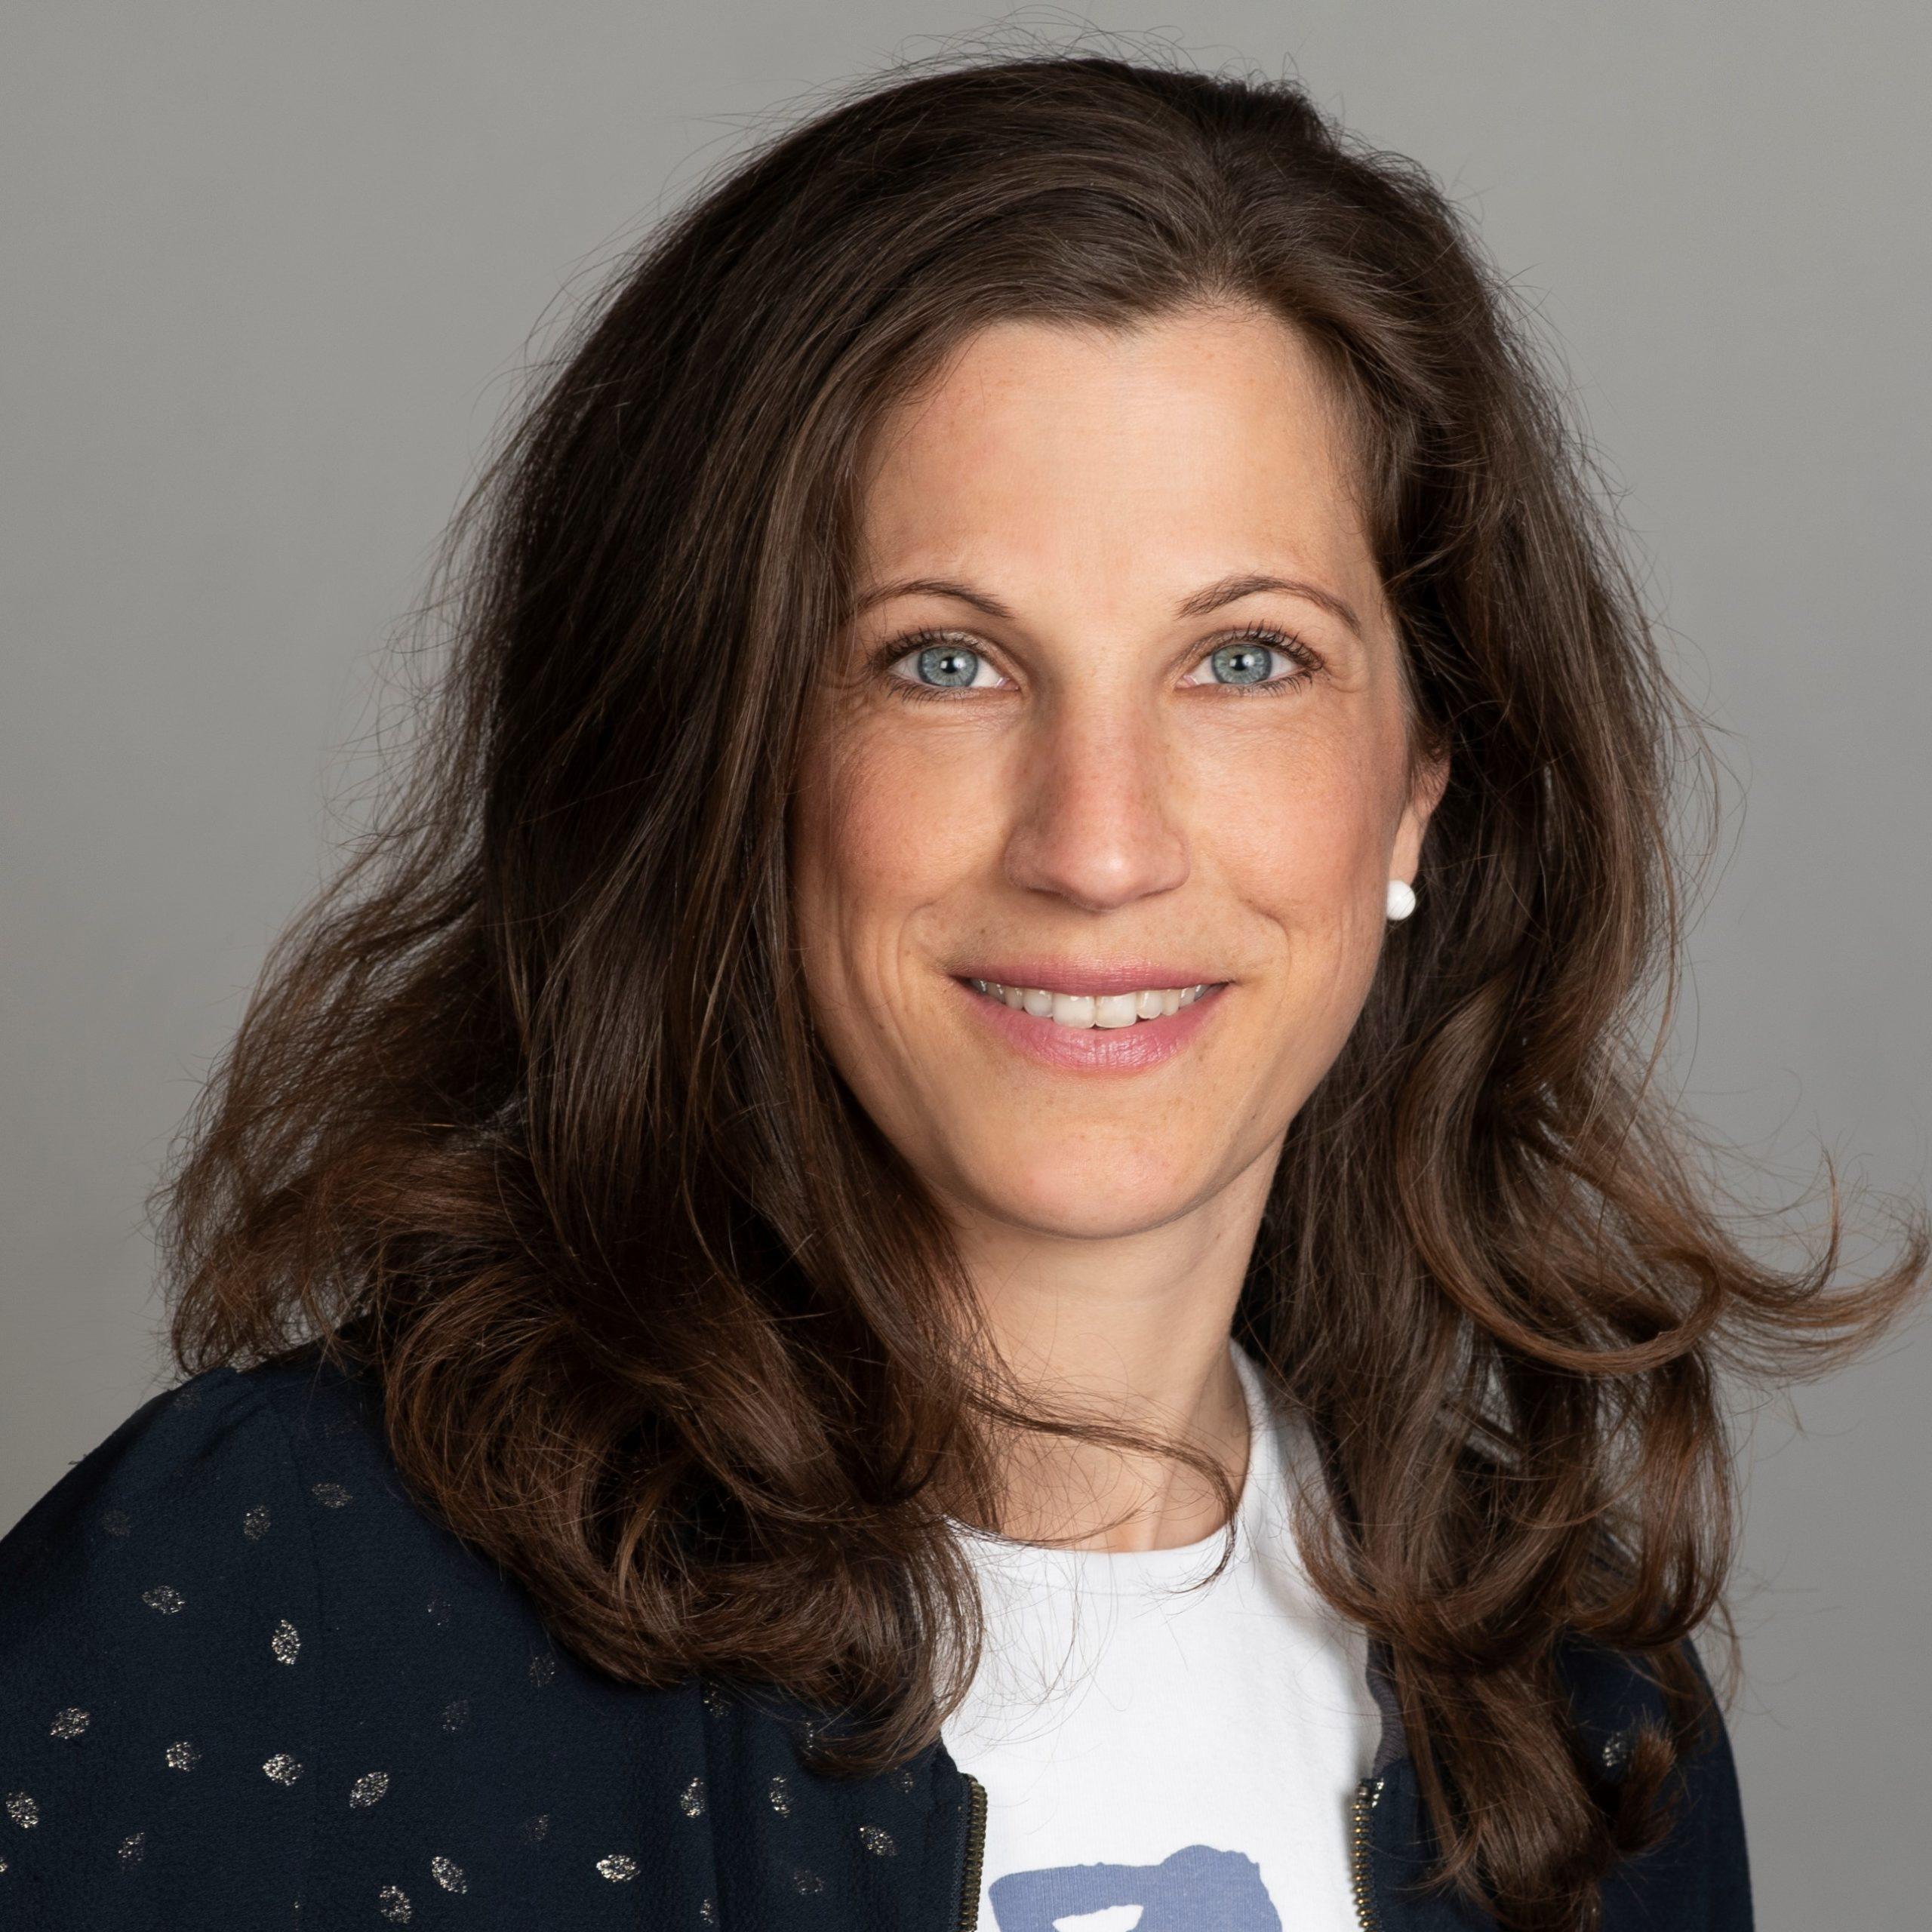 Johanna Schwan